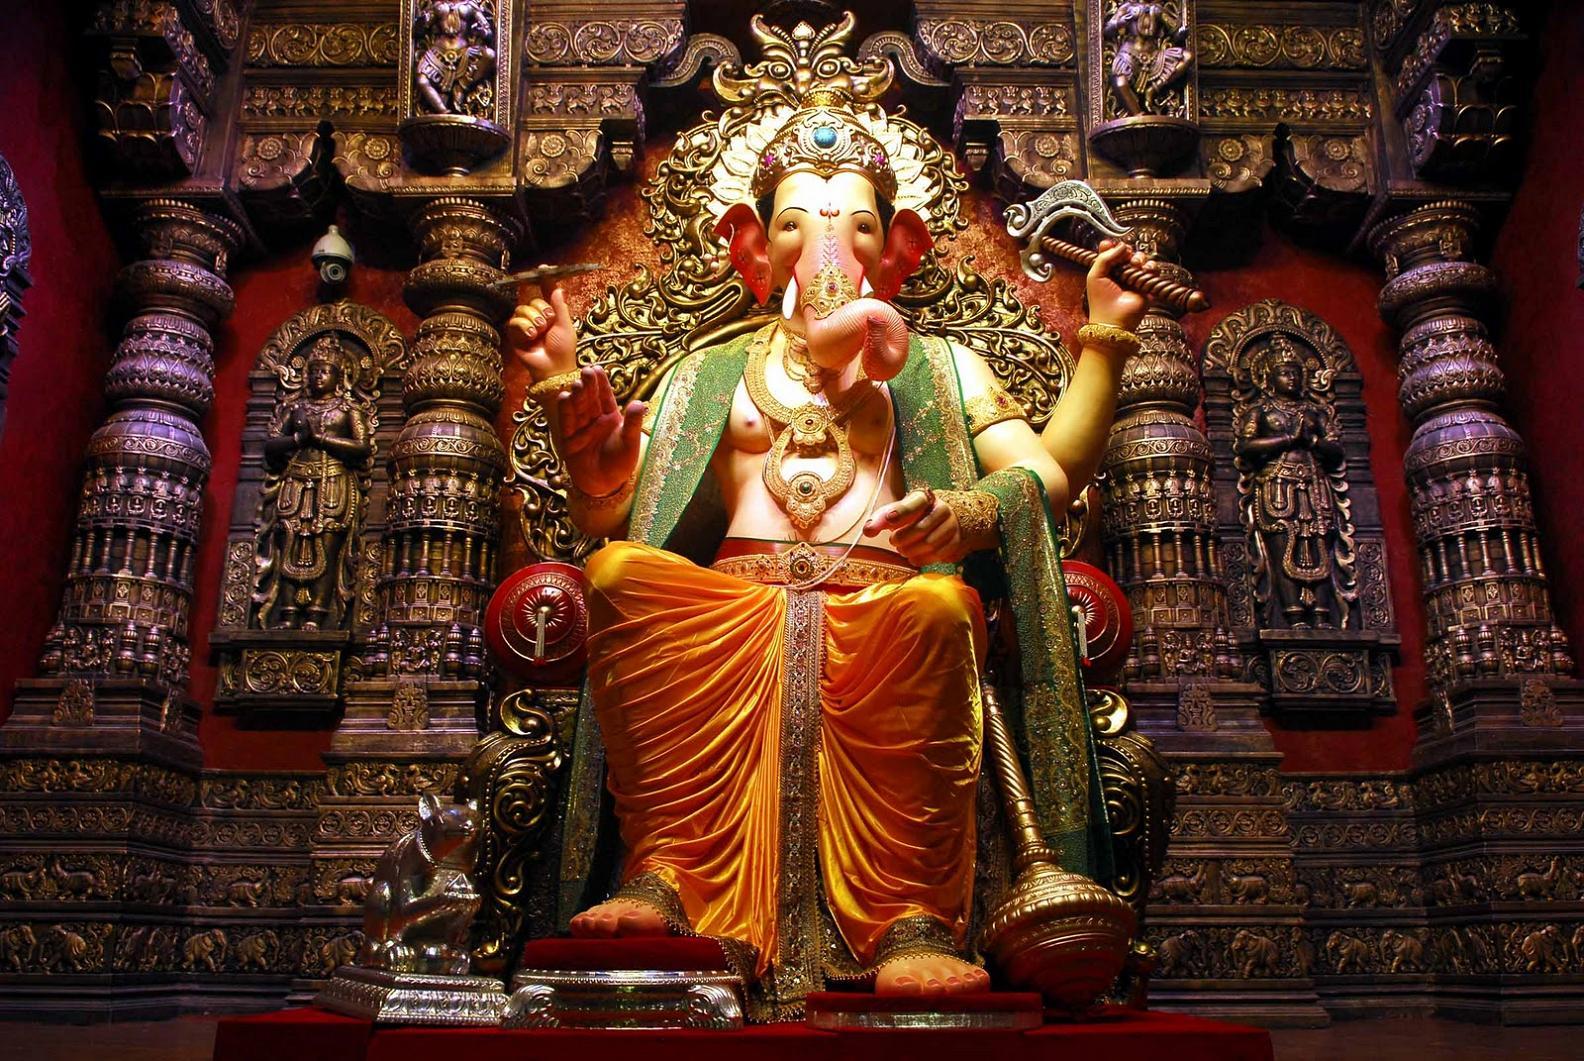 Rt Ganapati Bappa Morya Wallpapers Resources Mi Community